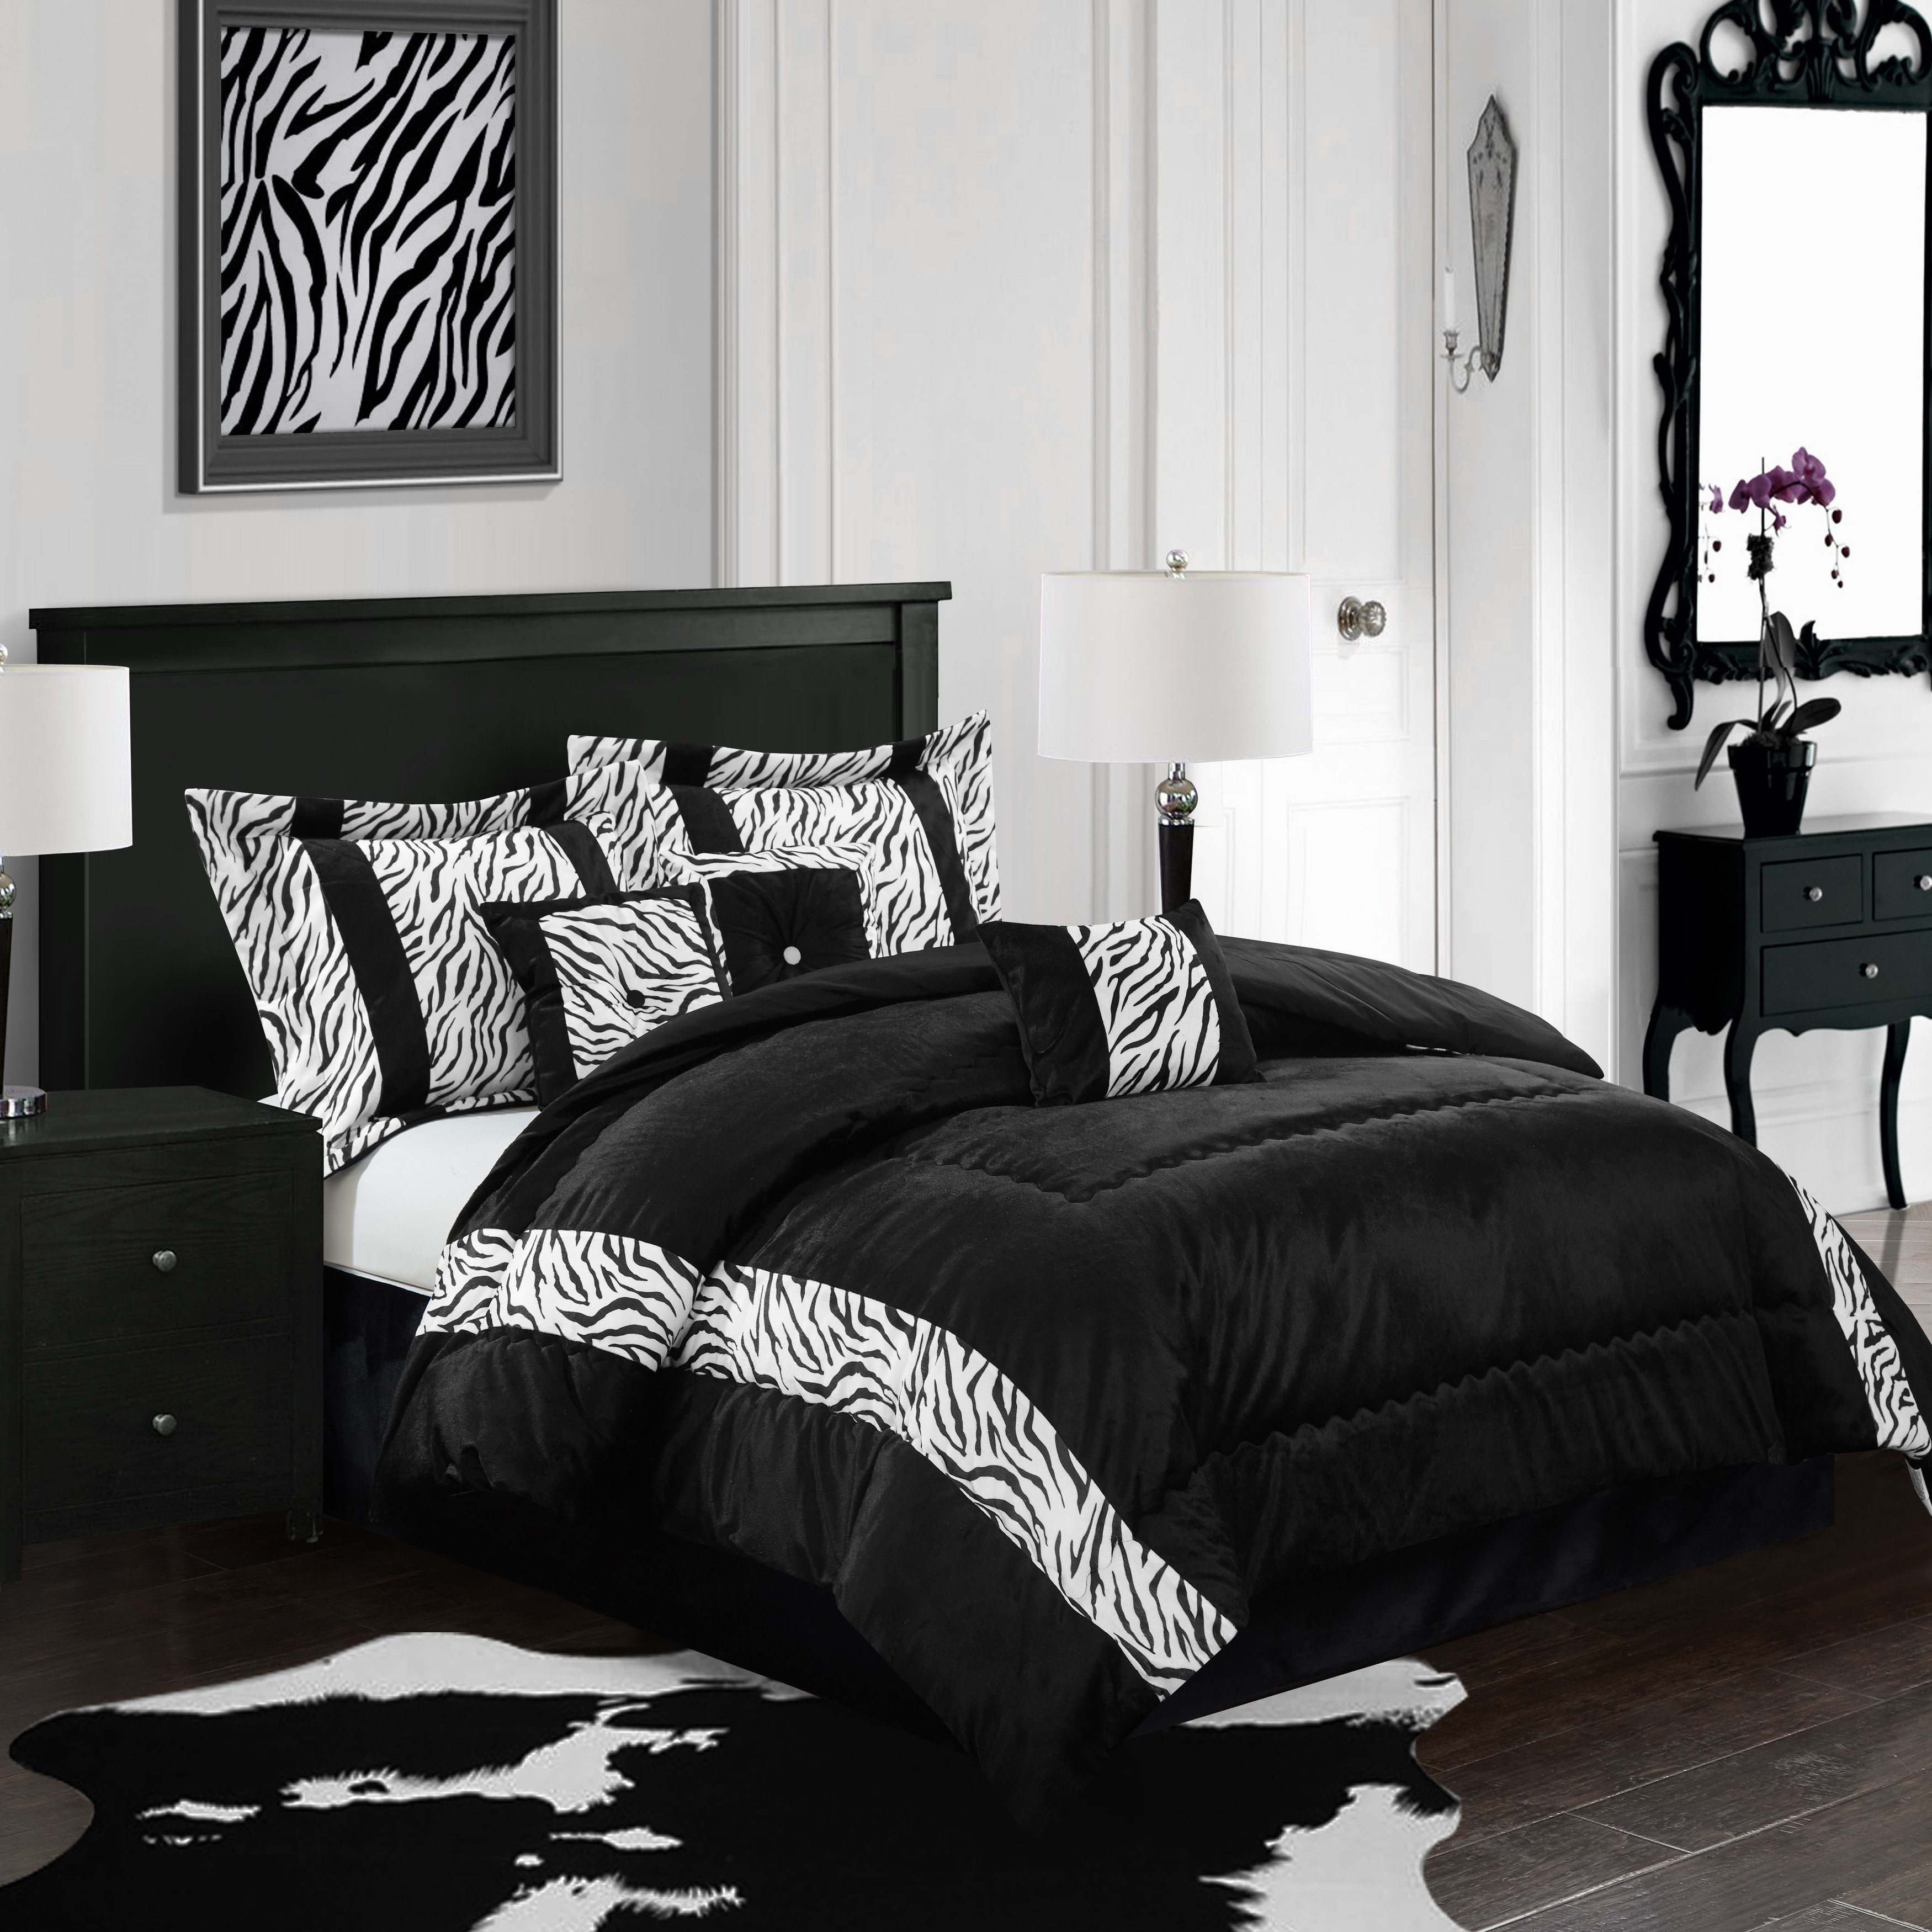 Nanshing Mali 7-piece Bedding Comforter Set (Queen), Blac...